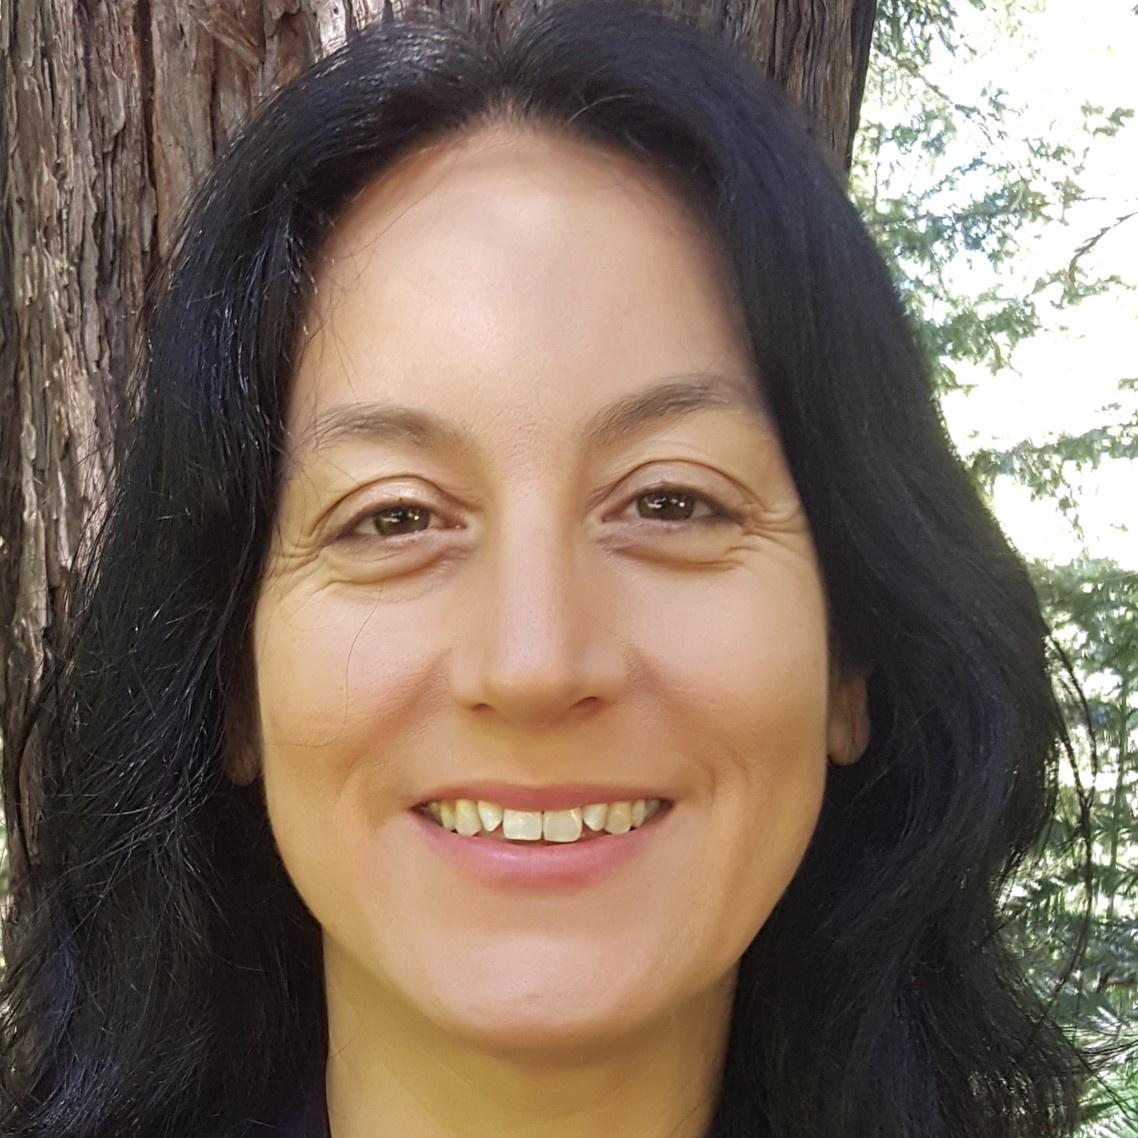 Ana Sophia Demetrakopoulos